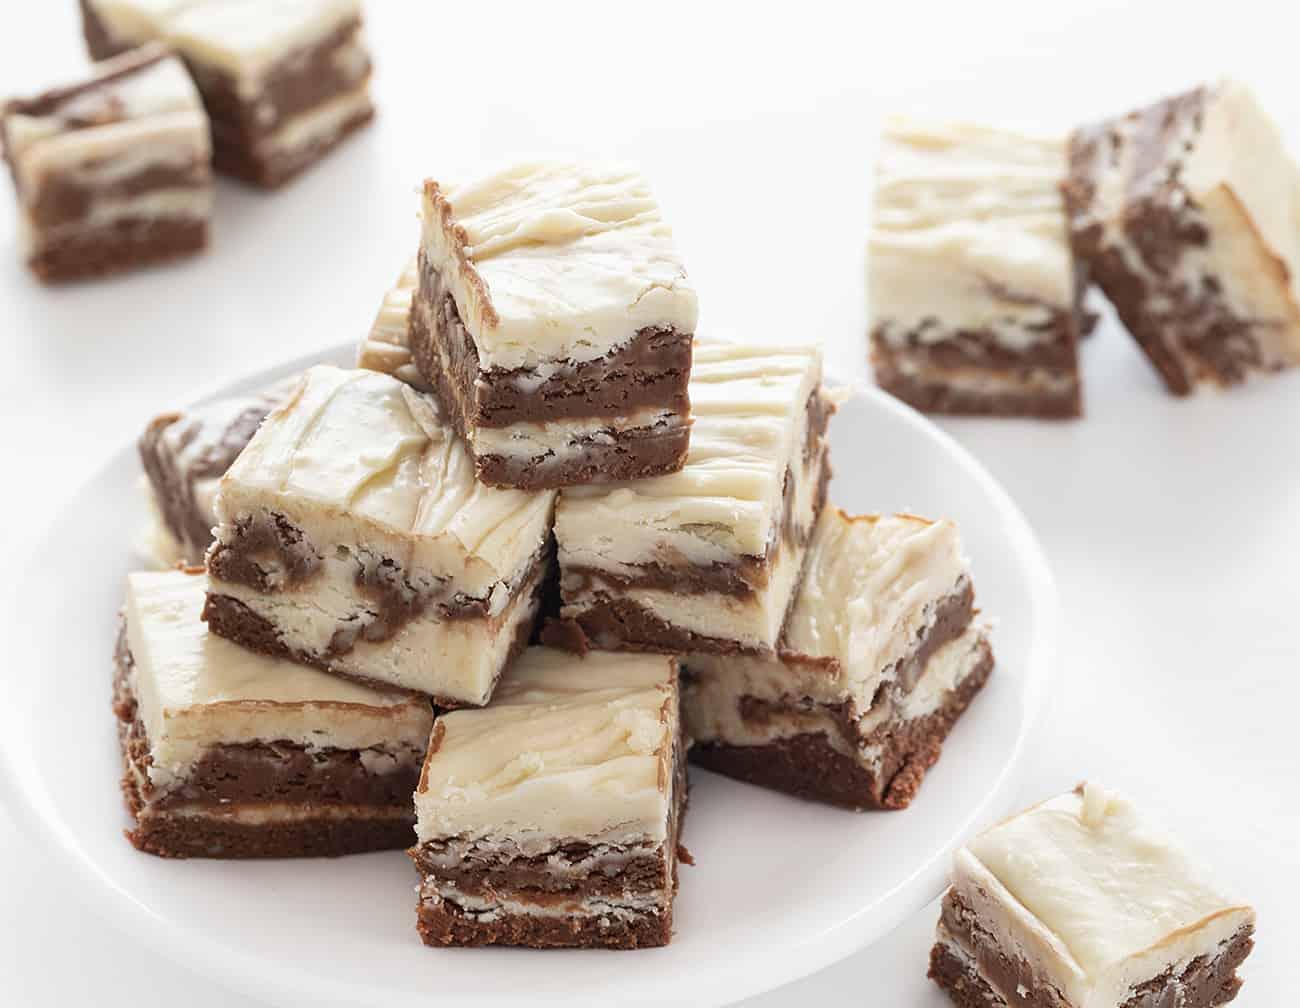 Plate of Chocolate Vanilla Marble Fudge Stacked